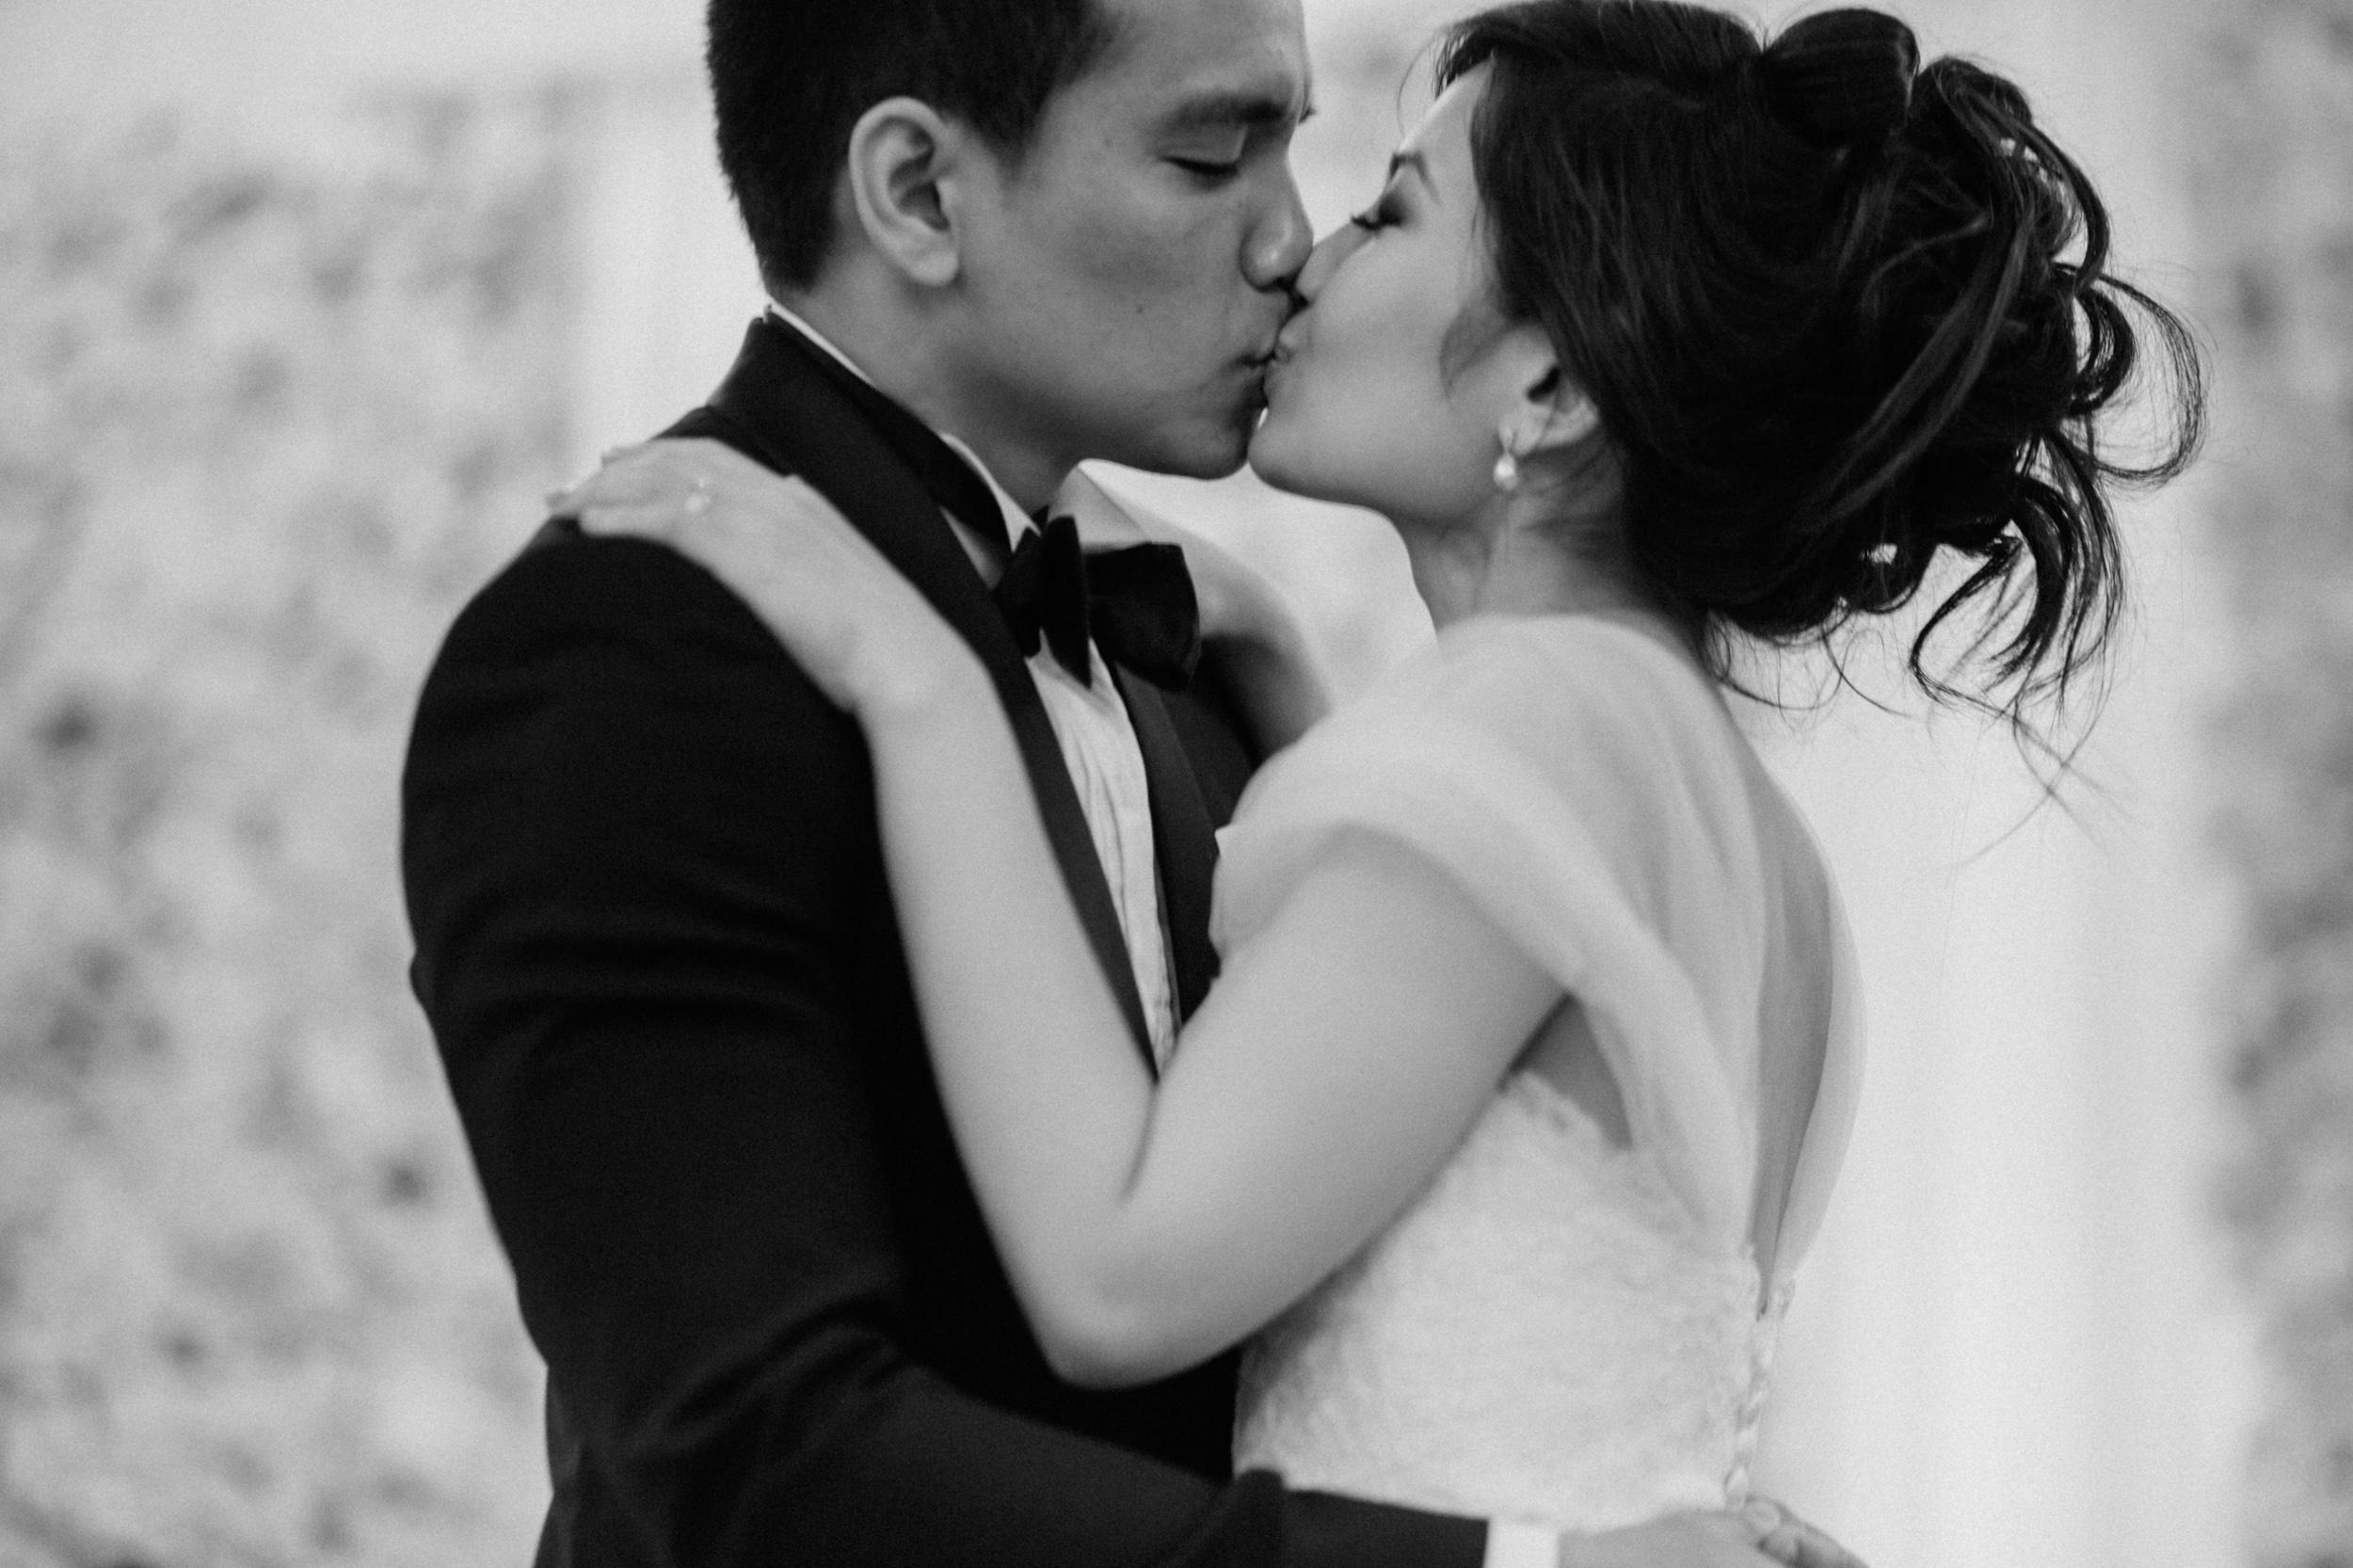 singapore-wedding-photographer-cheryl-matthew-fullerton-hotel-wedding-82.jpg